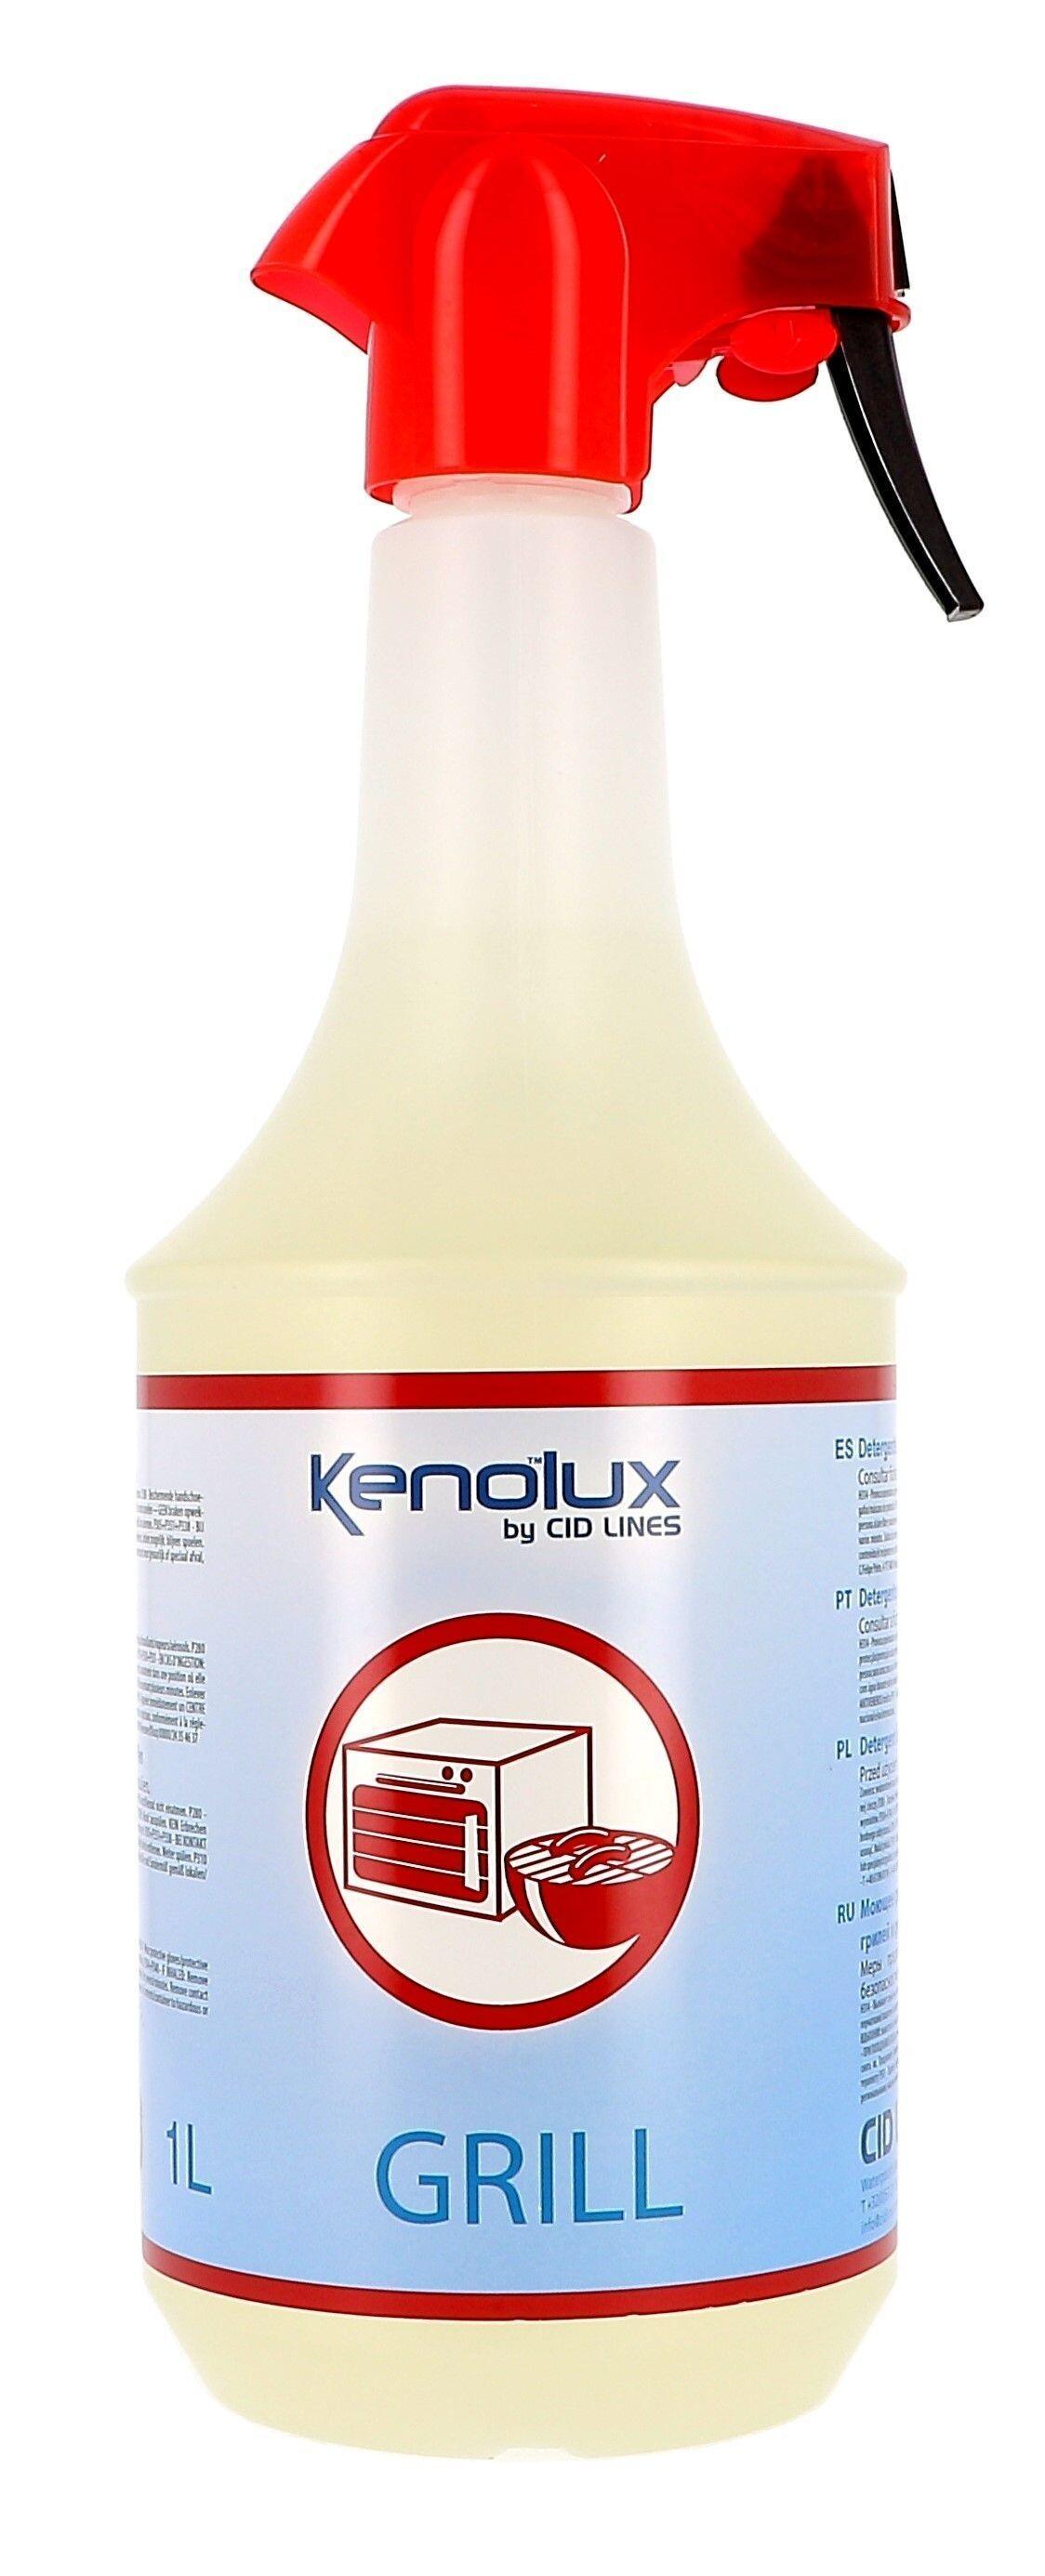 Kenolux Grill 1L CID Lines oven & grillreiniger (Reinigings-&kuisproducten)